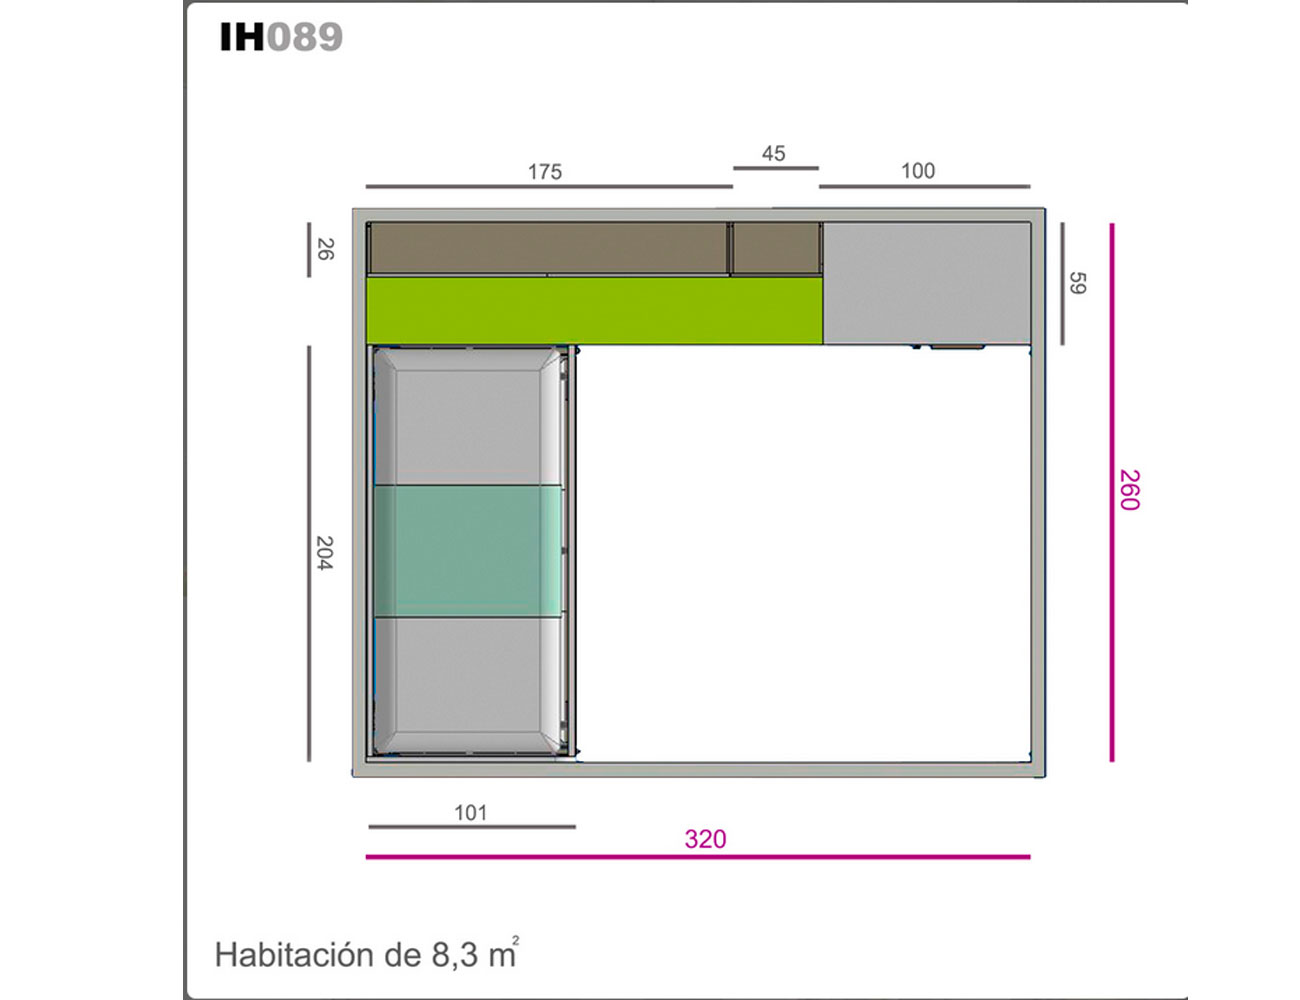 Ih089 medidas